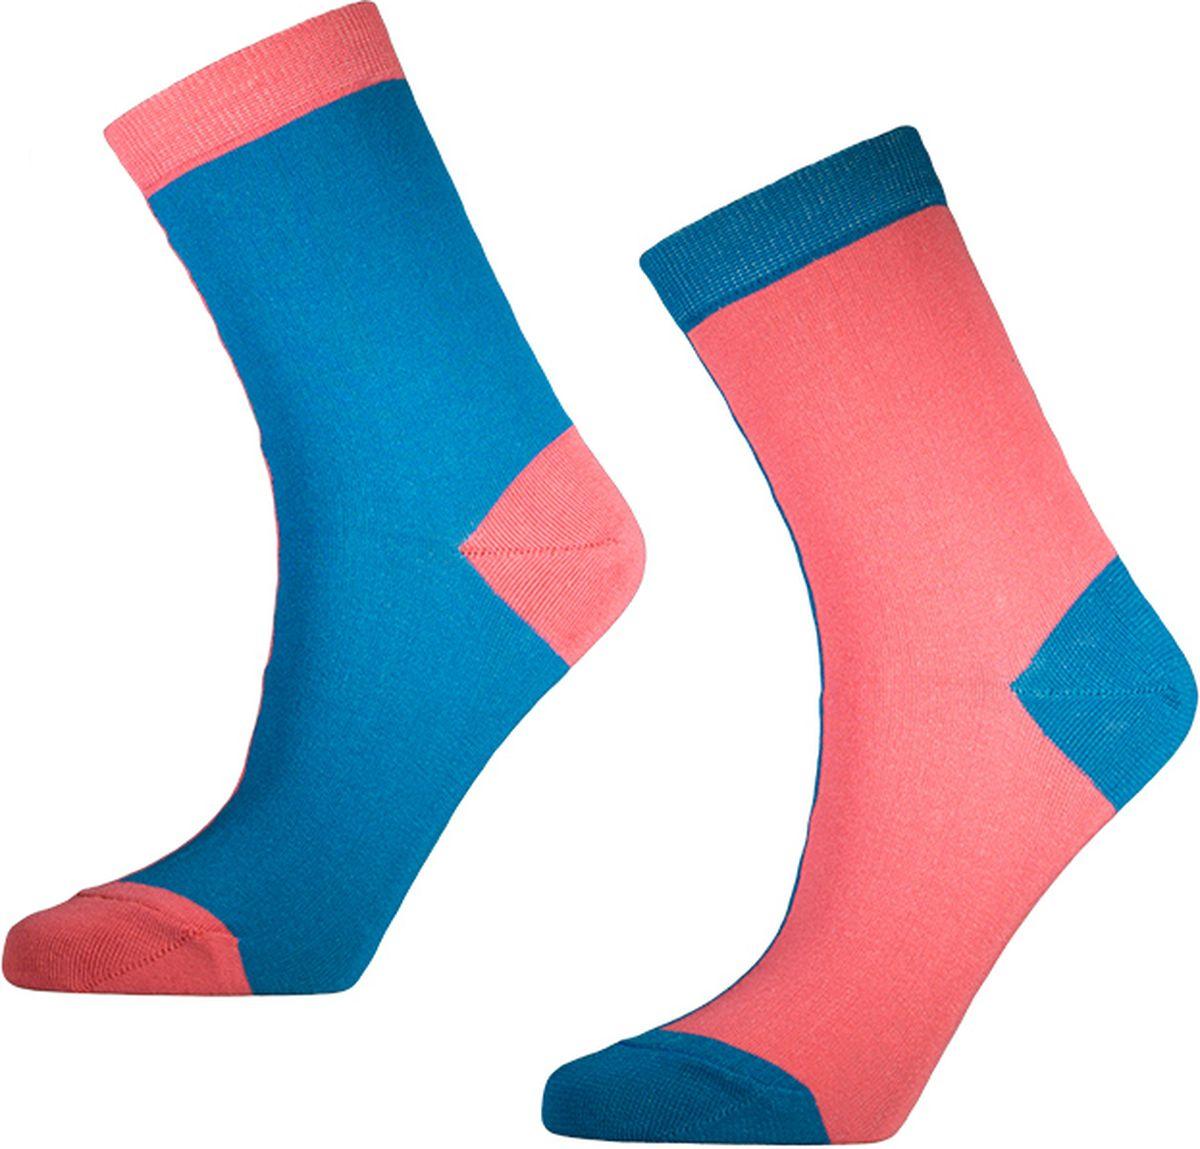 Фото - Носки мужские Big Bang Socks, цвет: розовый, голубой, 2 пары. d451. Размер 40/44 genuine leather men travel bags luggage women fashion totes big bag male crossbody business shoulder handbag